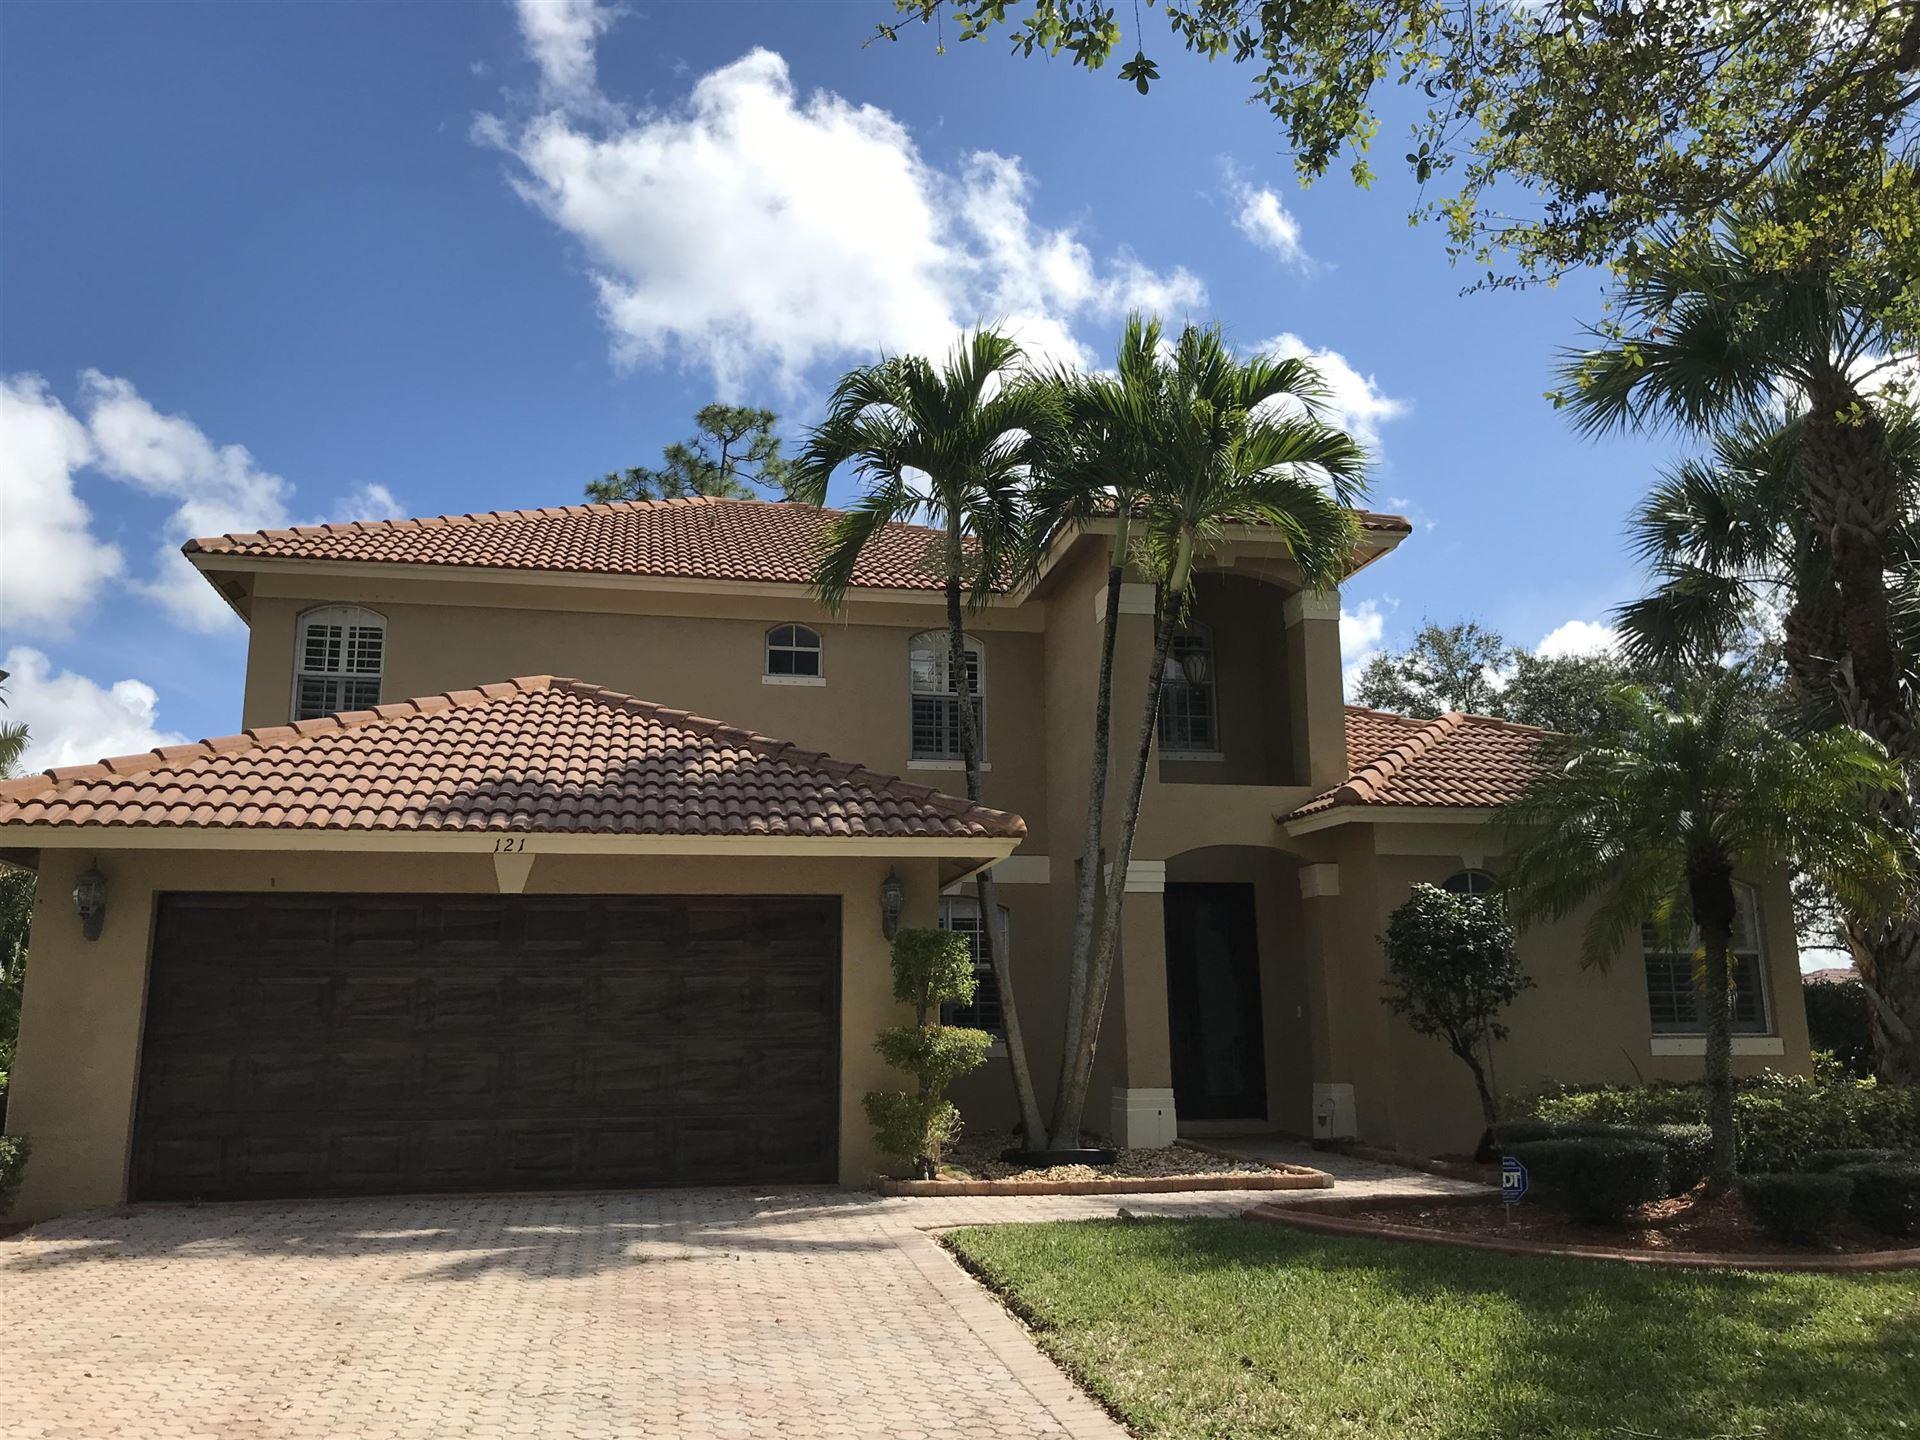 121 Silver Bell Crescent, Royal Palm Beach, FL 33411 - #: RX-10603249